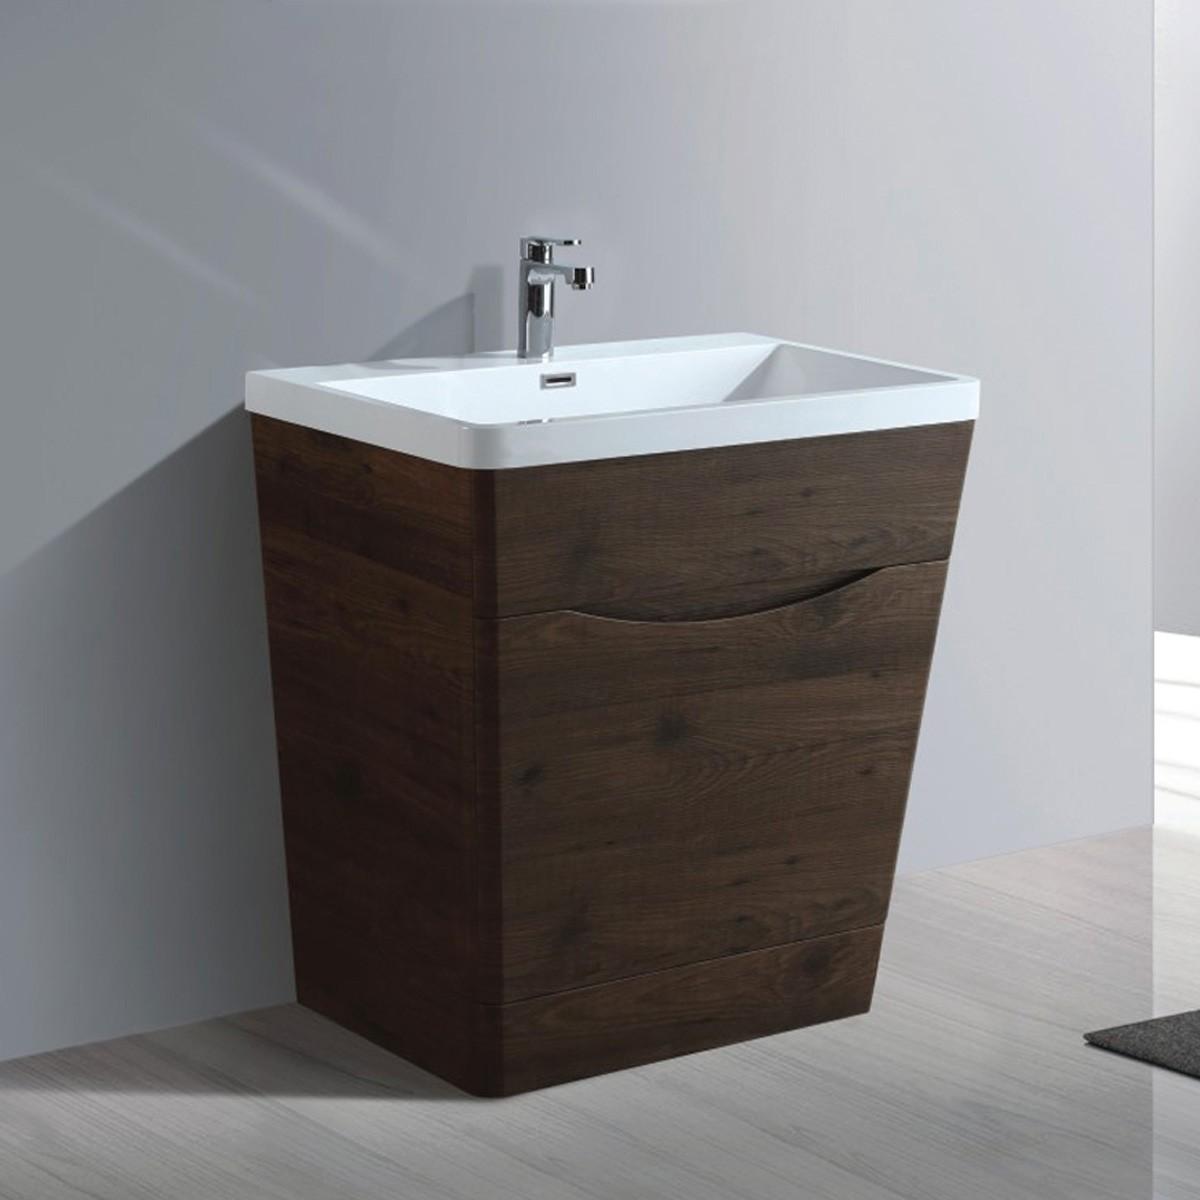 32 In. Bathroom Vanity with Basin (MY8001-V)